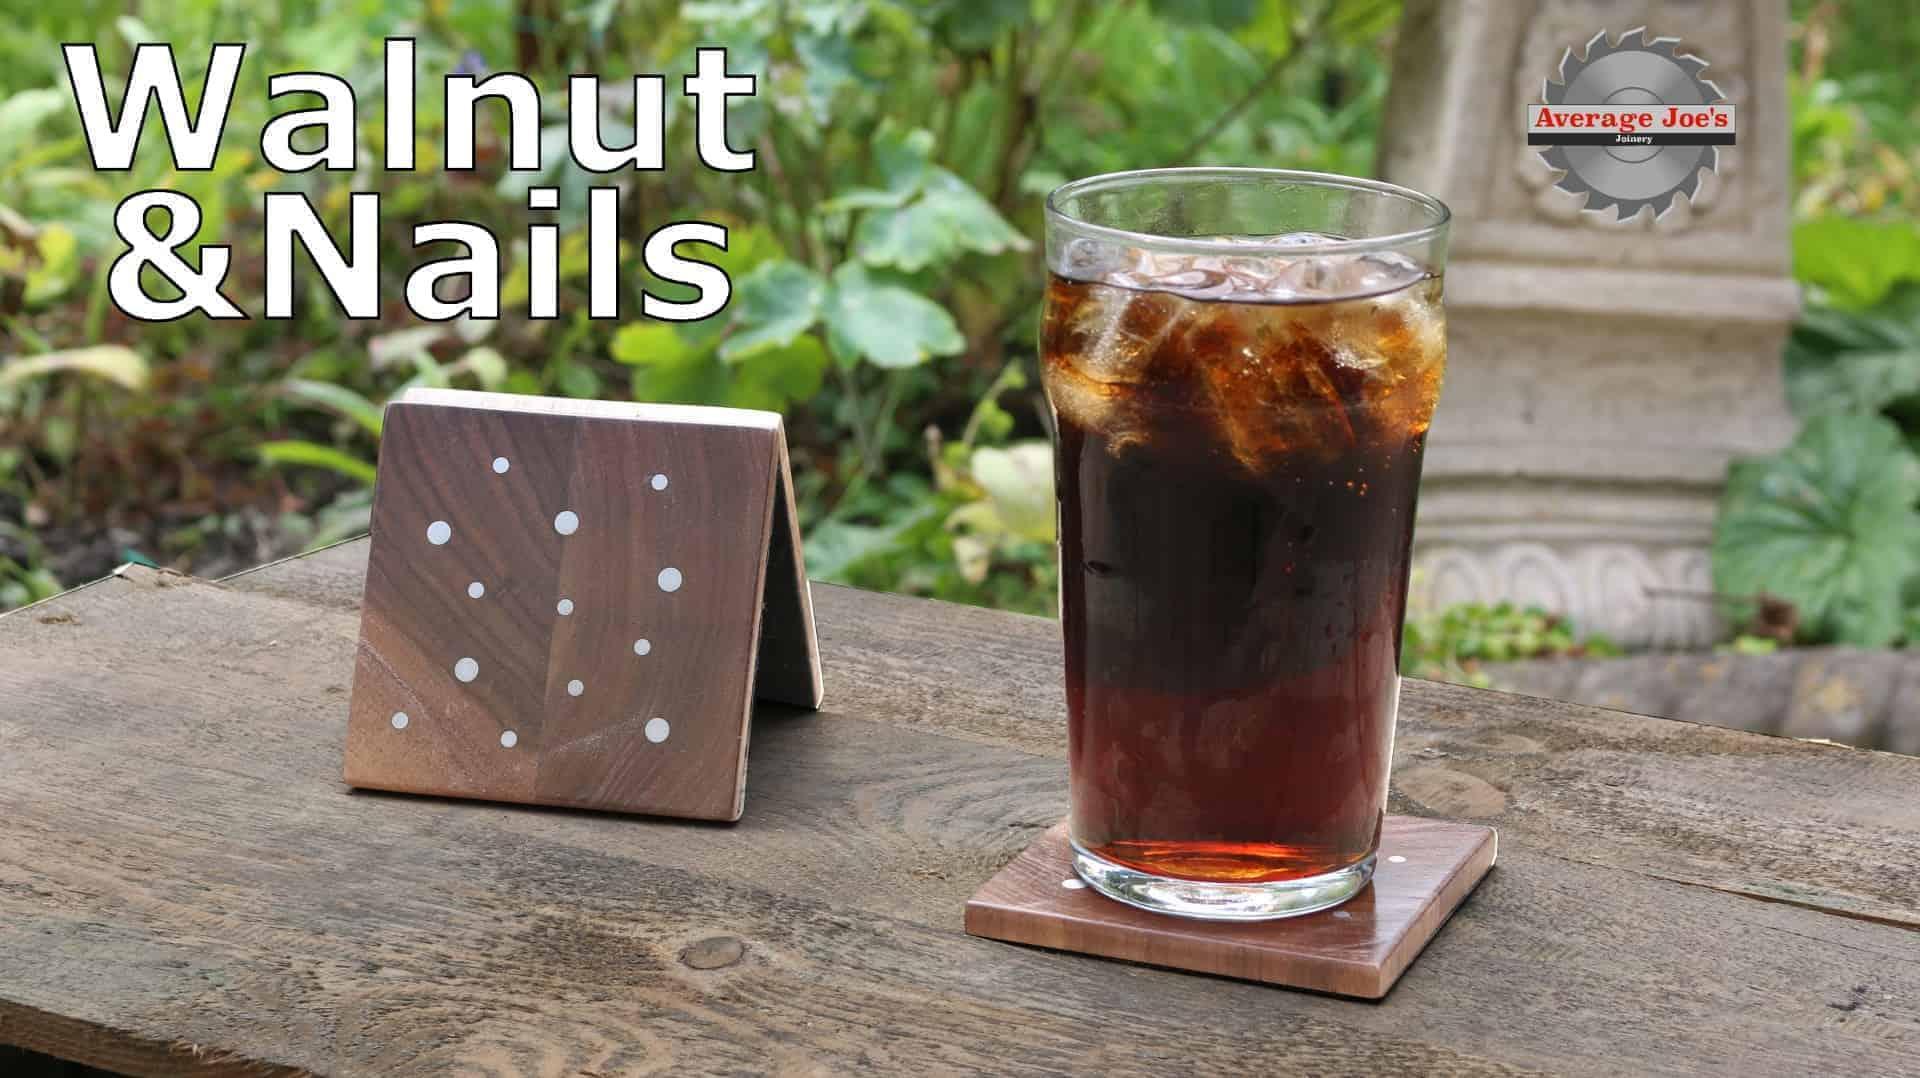 DIY walnut and nail coasters